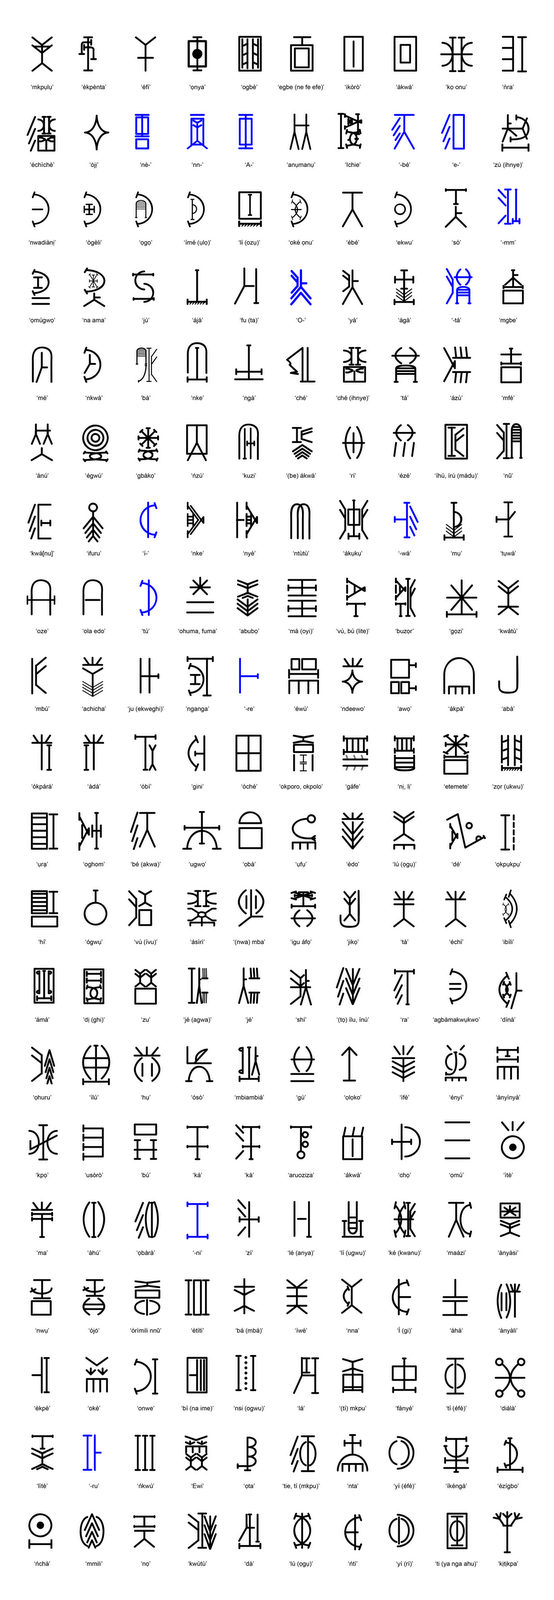 Nsibidi Writing System Page 3 Skyscrapercity Tetovanie